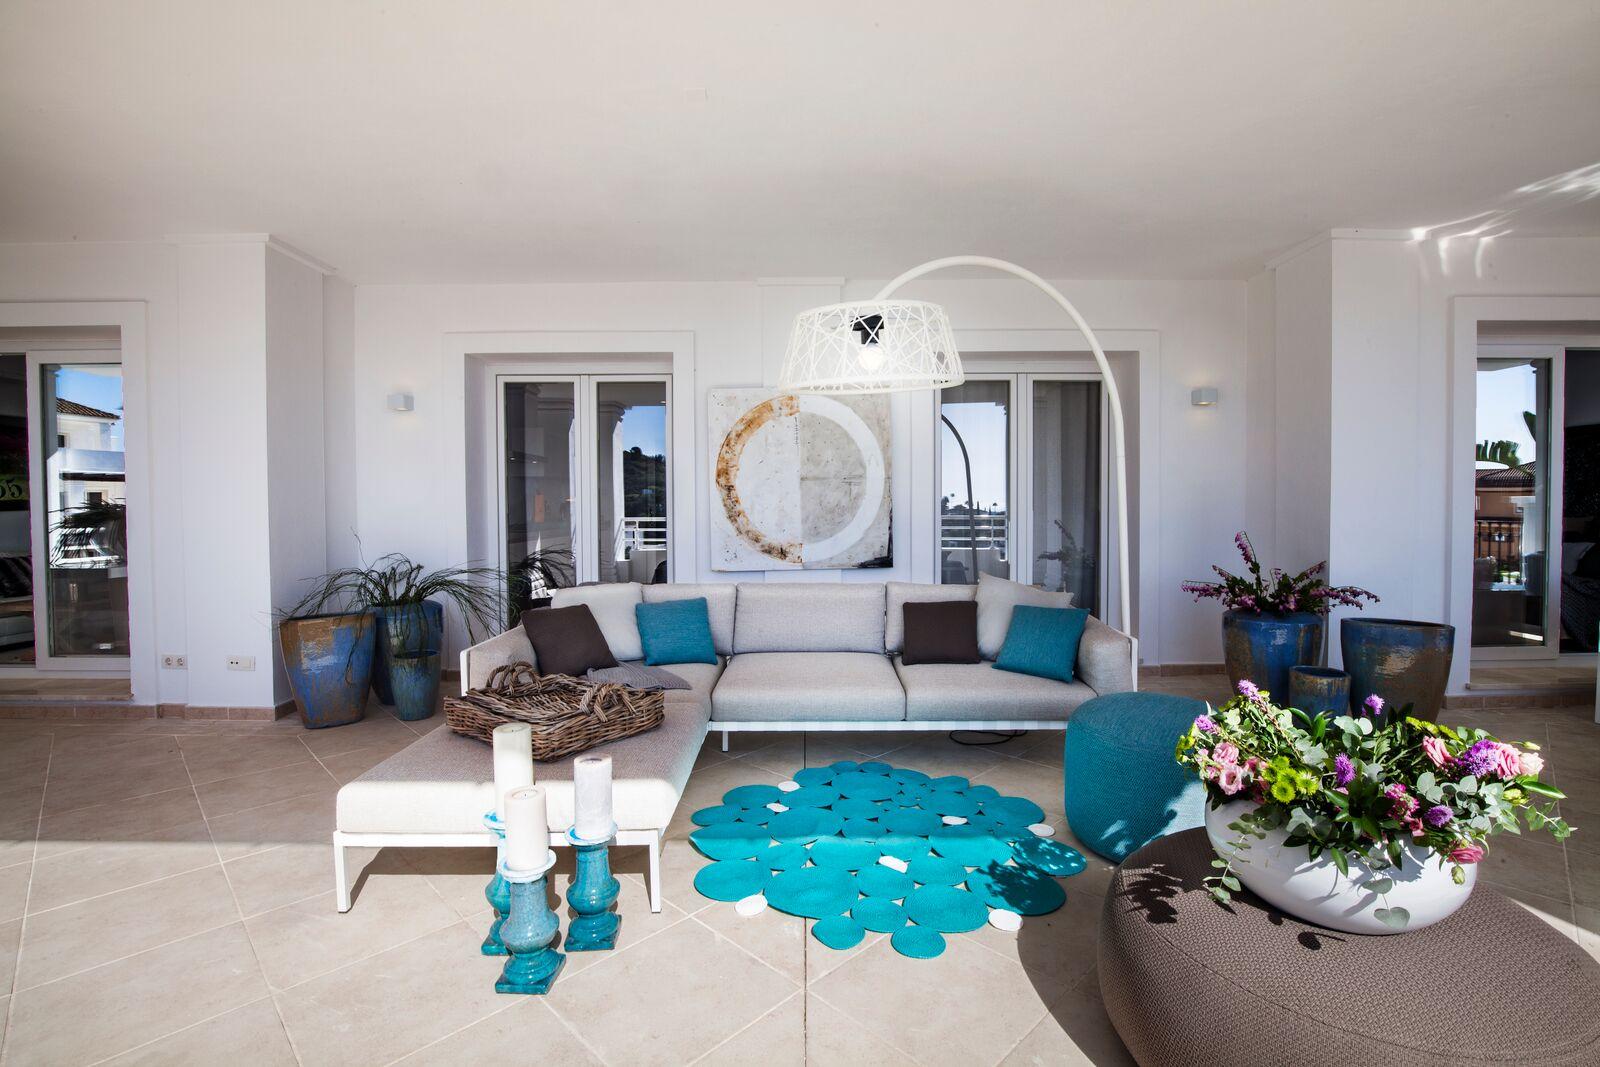 Aloha-suites-Exterior-1